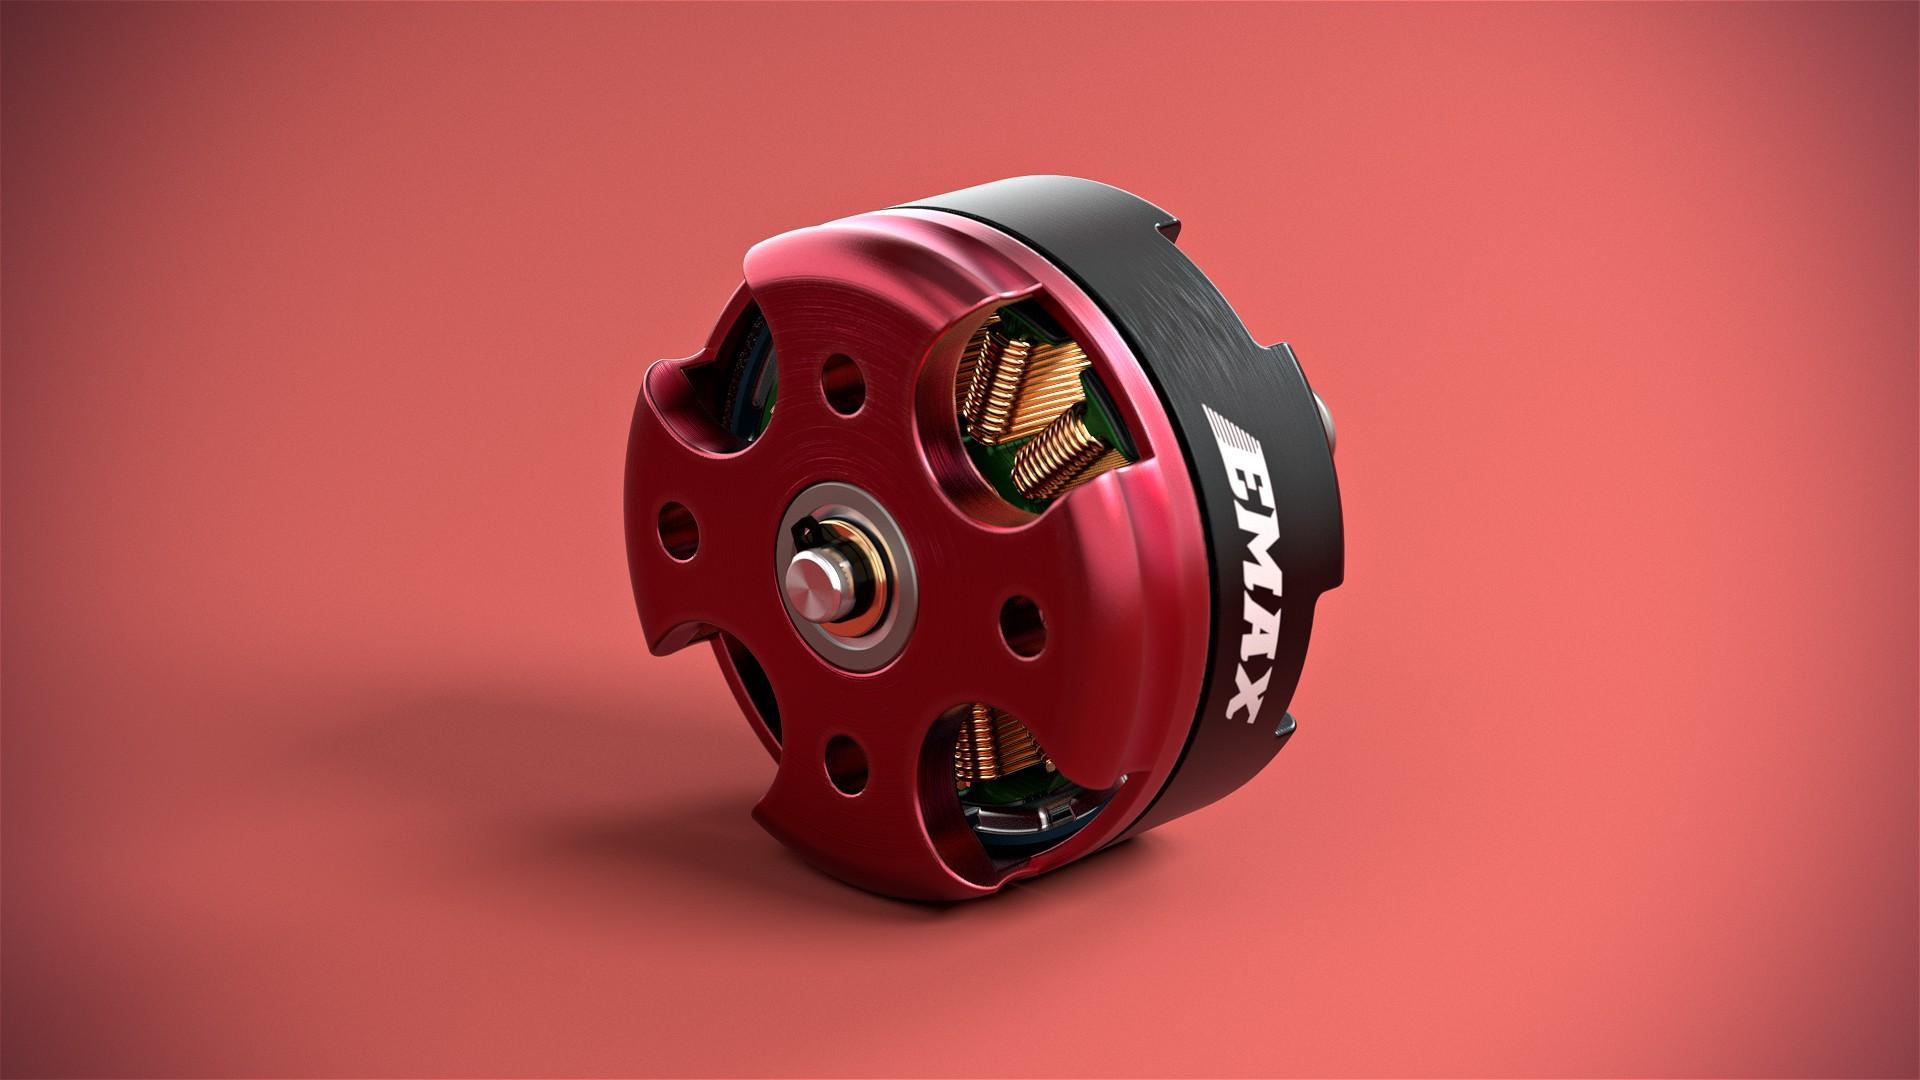 EMAX - Motor - 3D Produktanimation Werbung